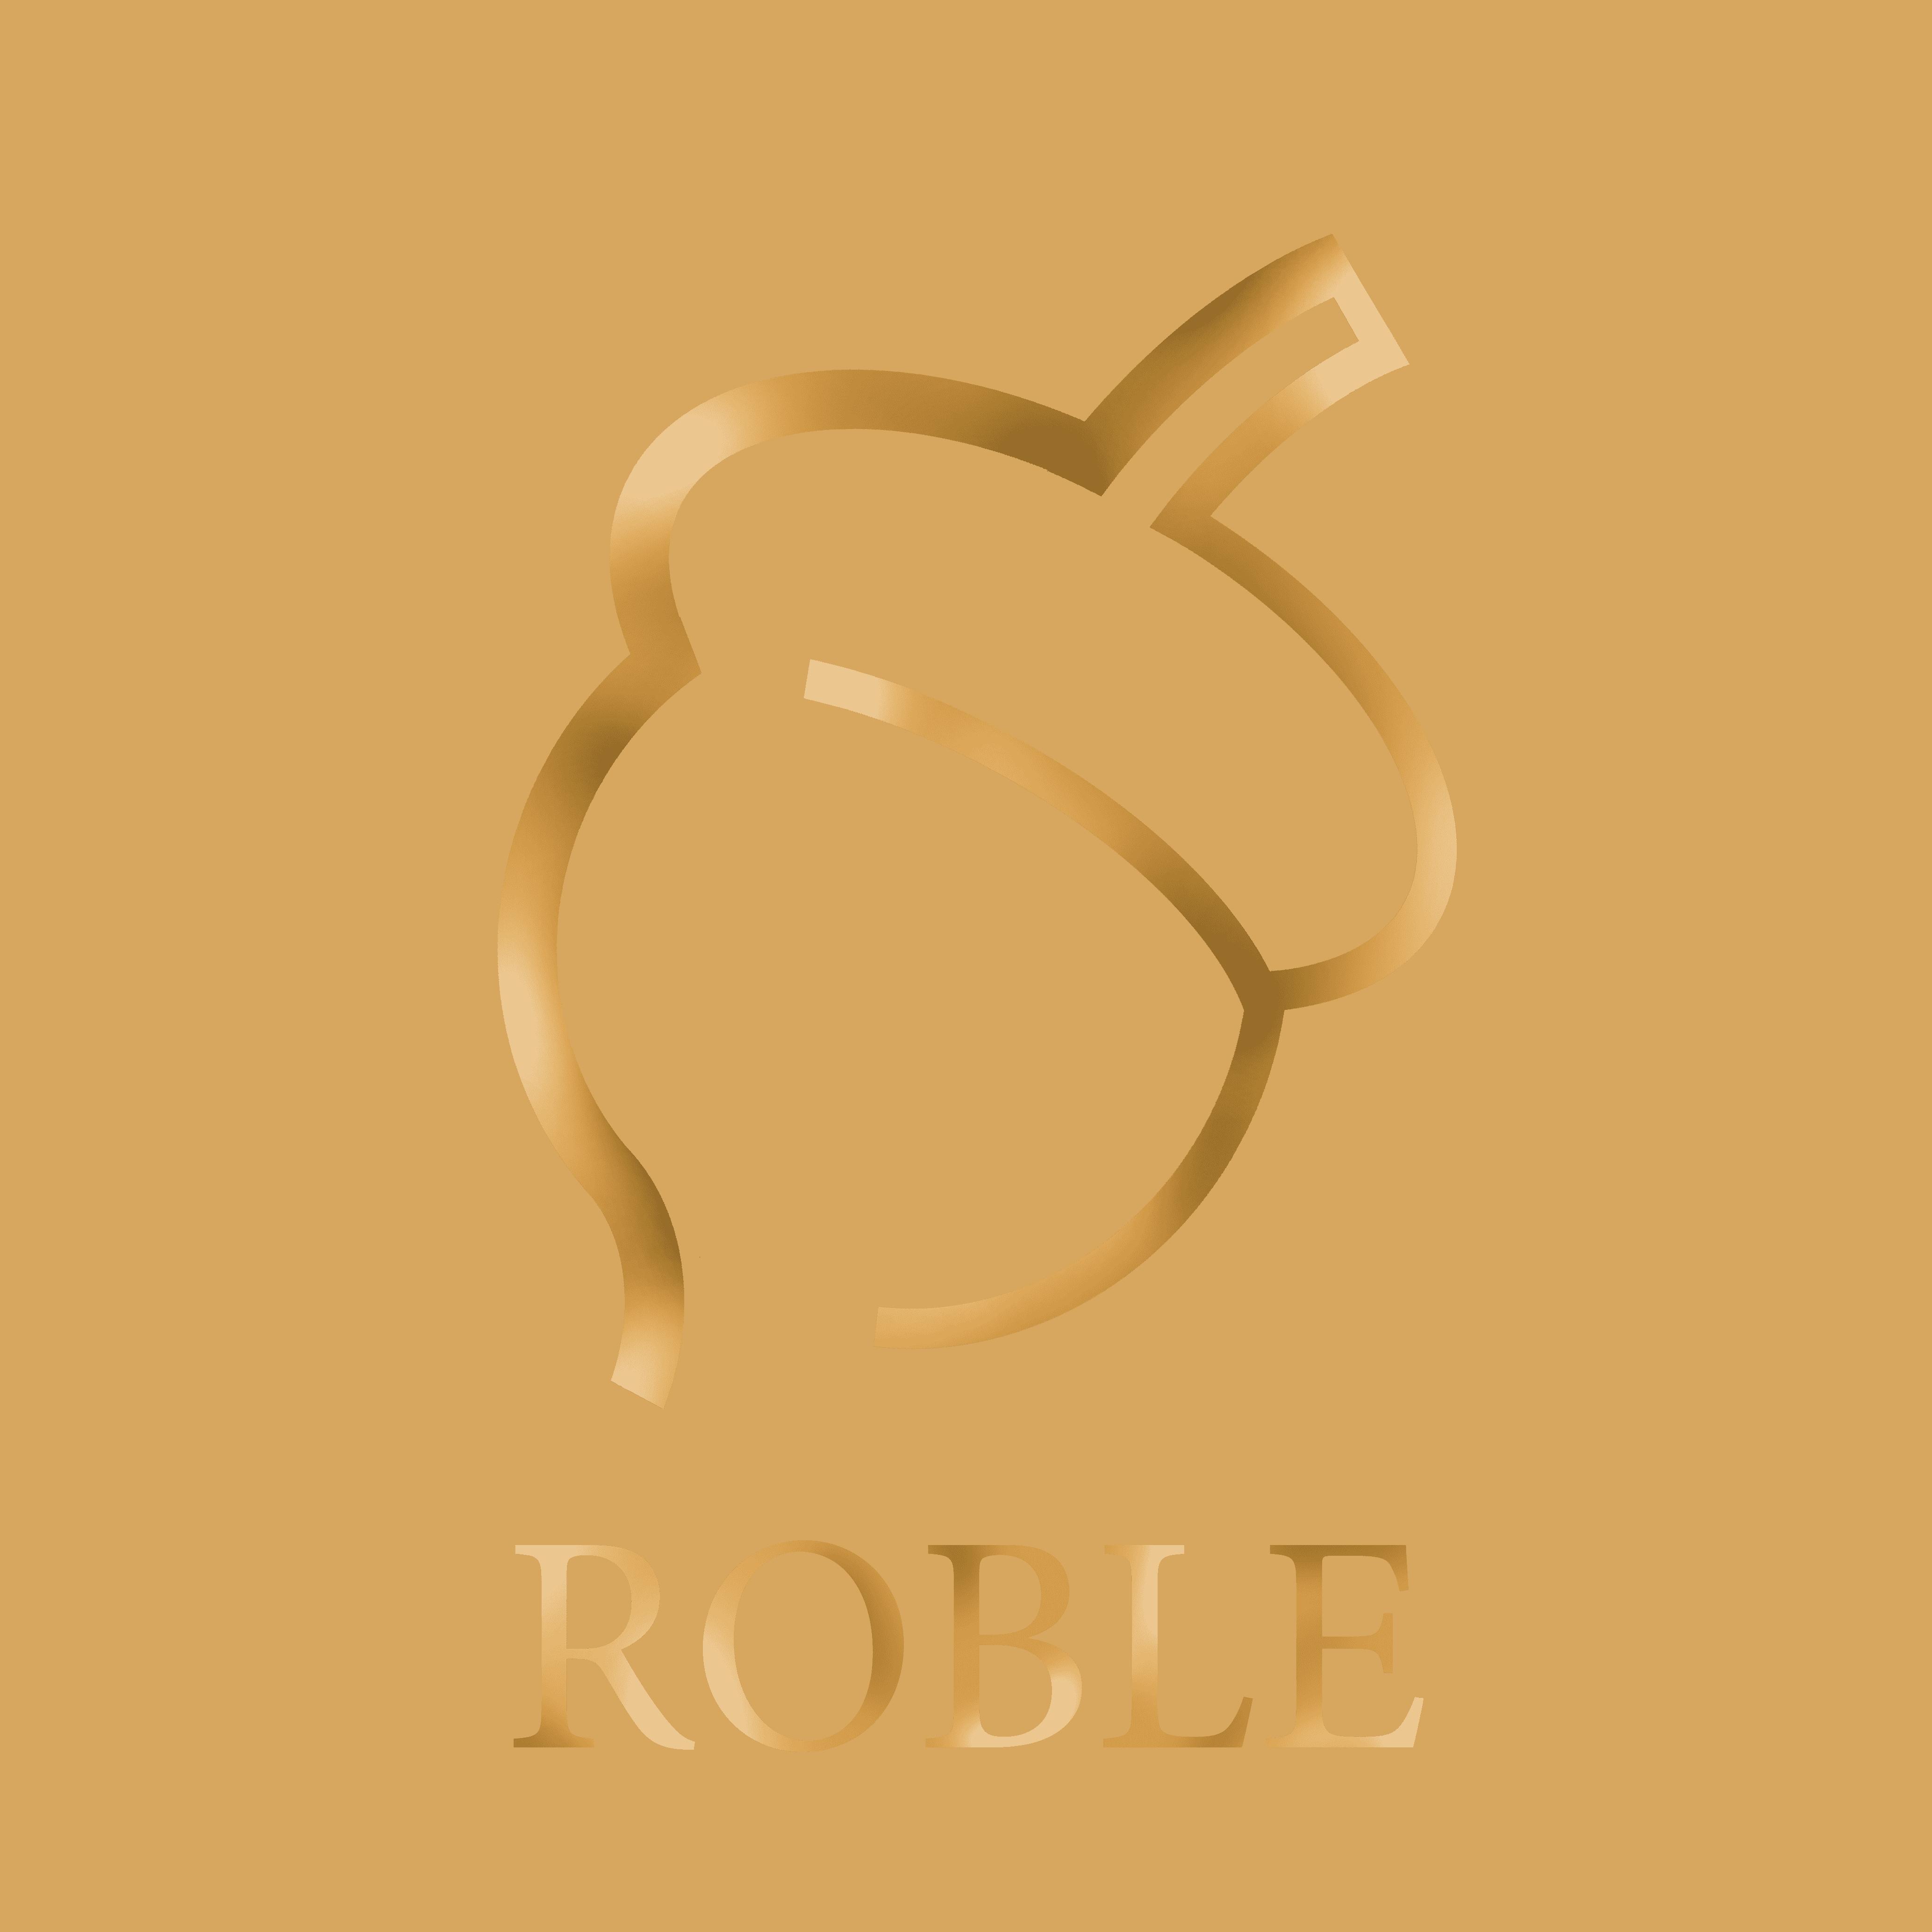 Roble blog